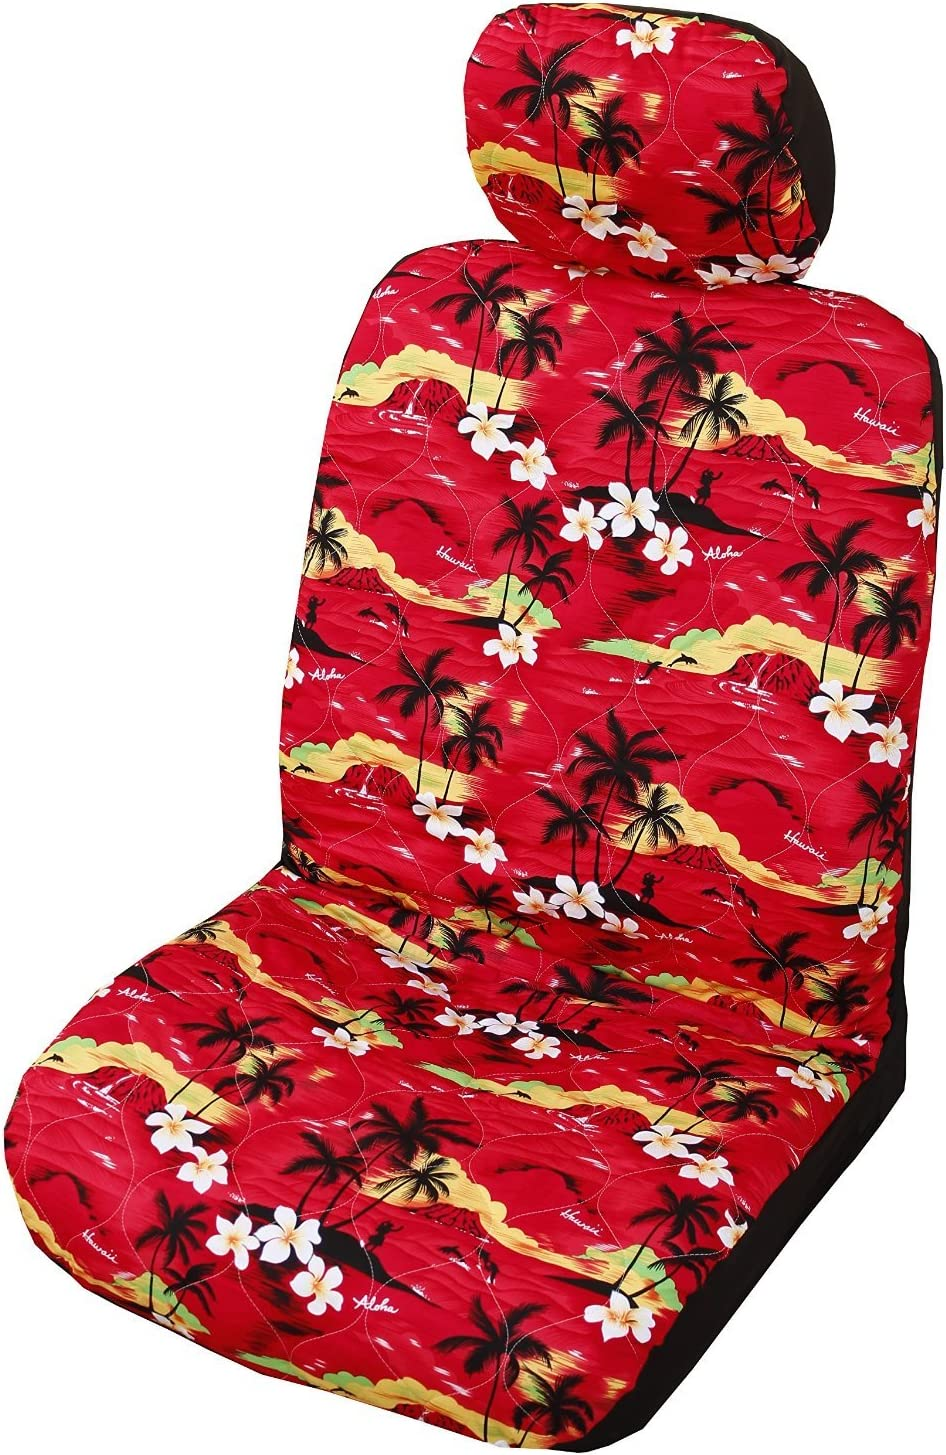 Black Quad Works Gripper Seat Cover 05-09 POLARIS SPORTS500H